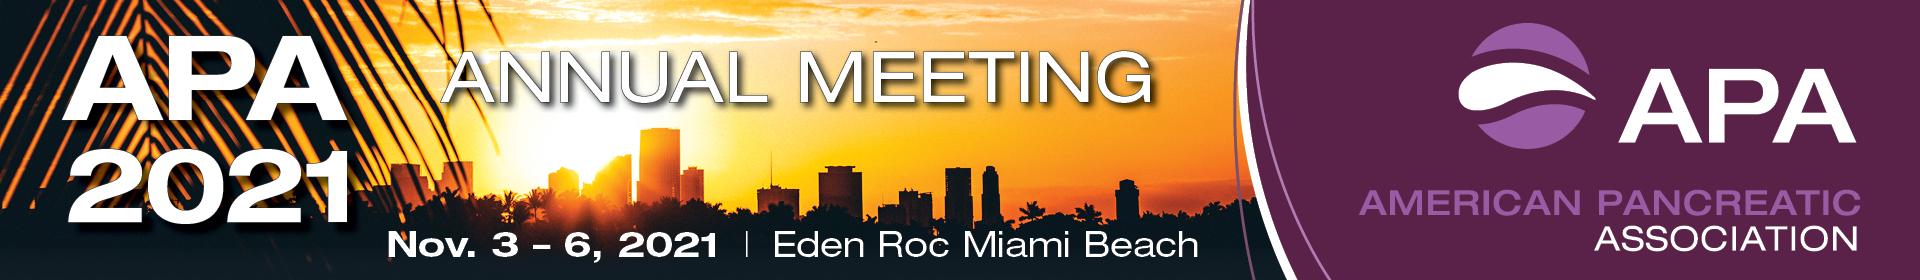 American Pancreatic Association 2021 Event Banner